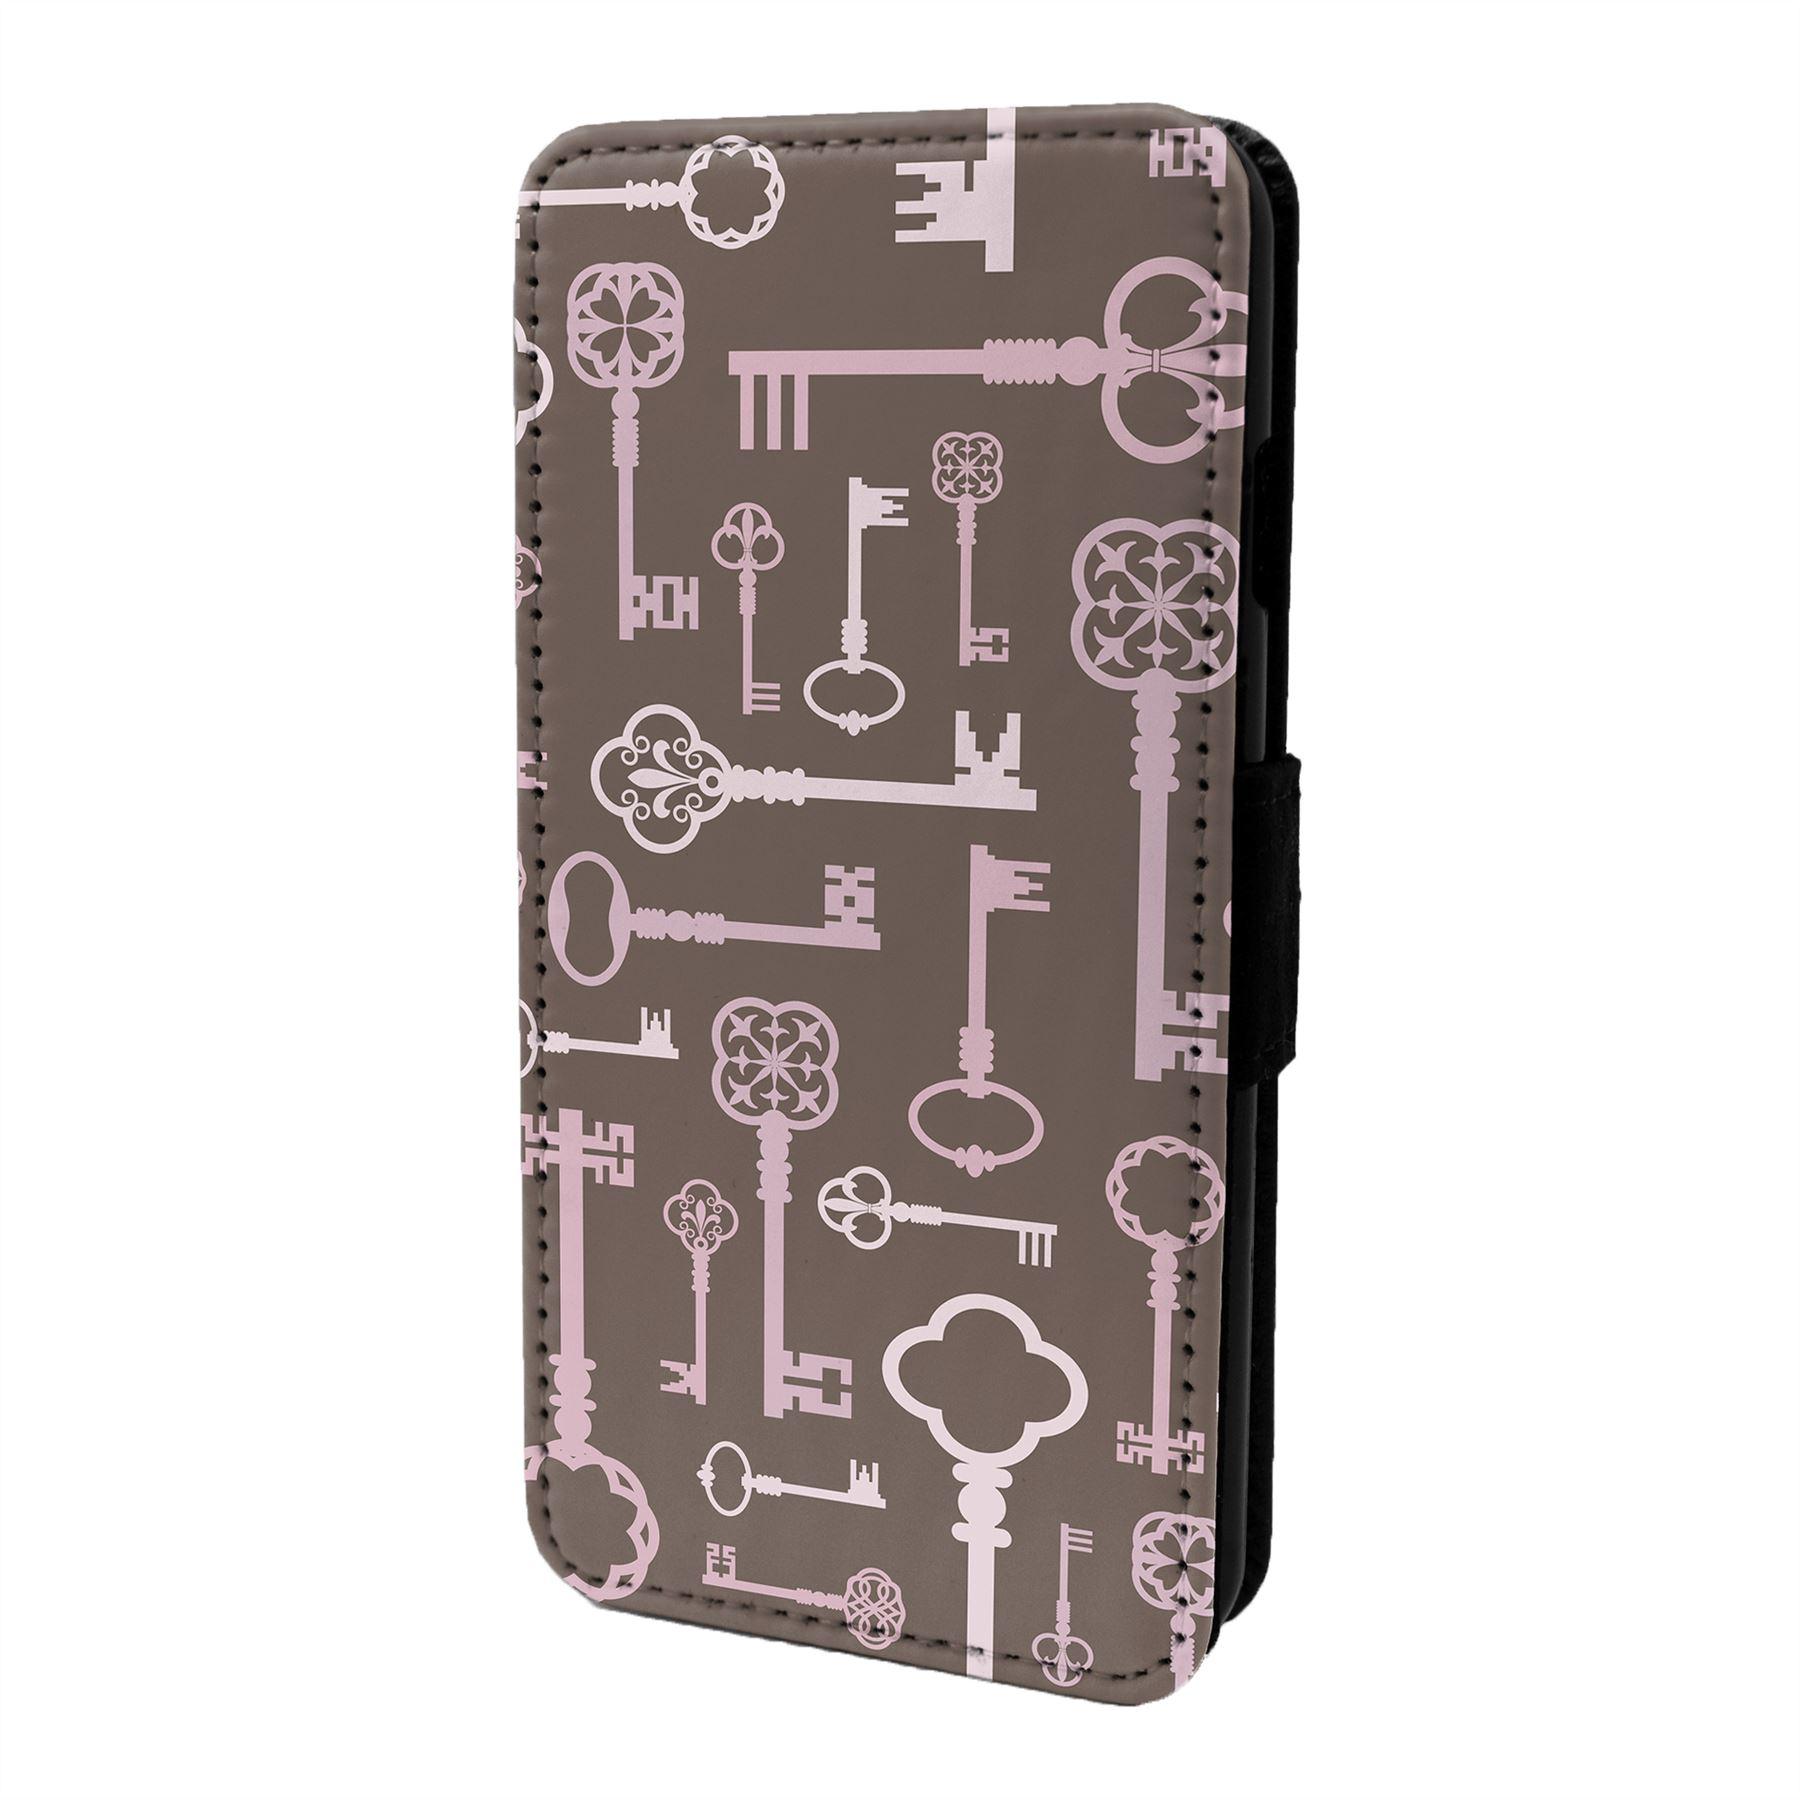 Retro-Key-Estampado-Funda-Libro-para-Telefono-Movil-S7062